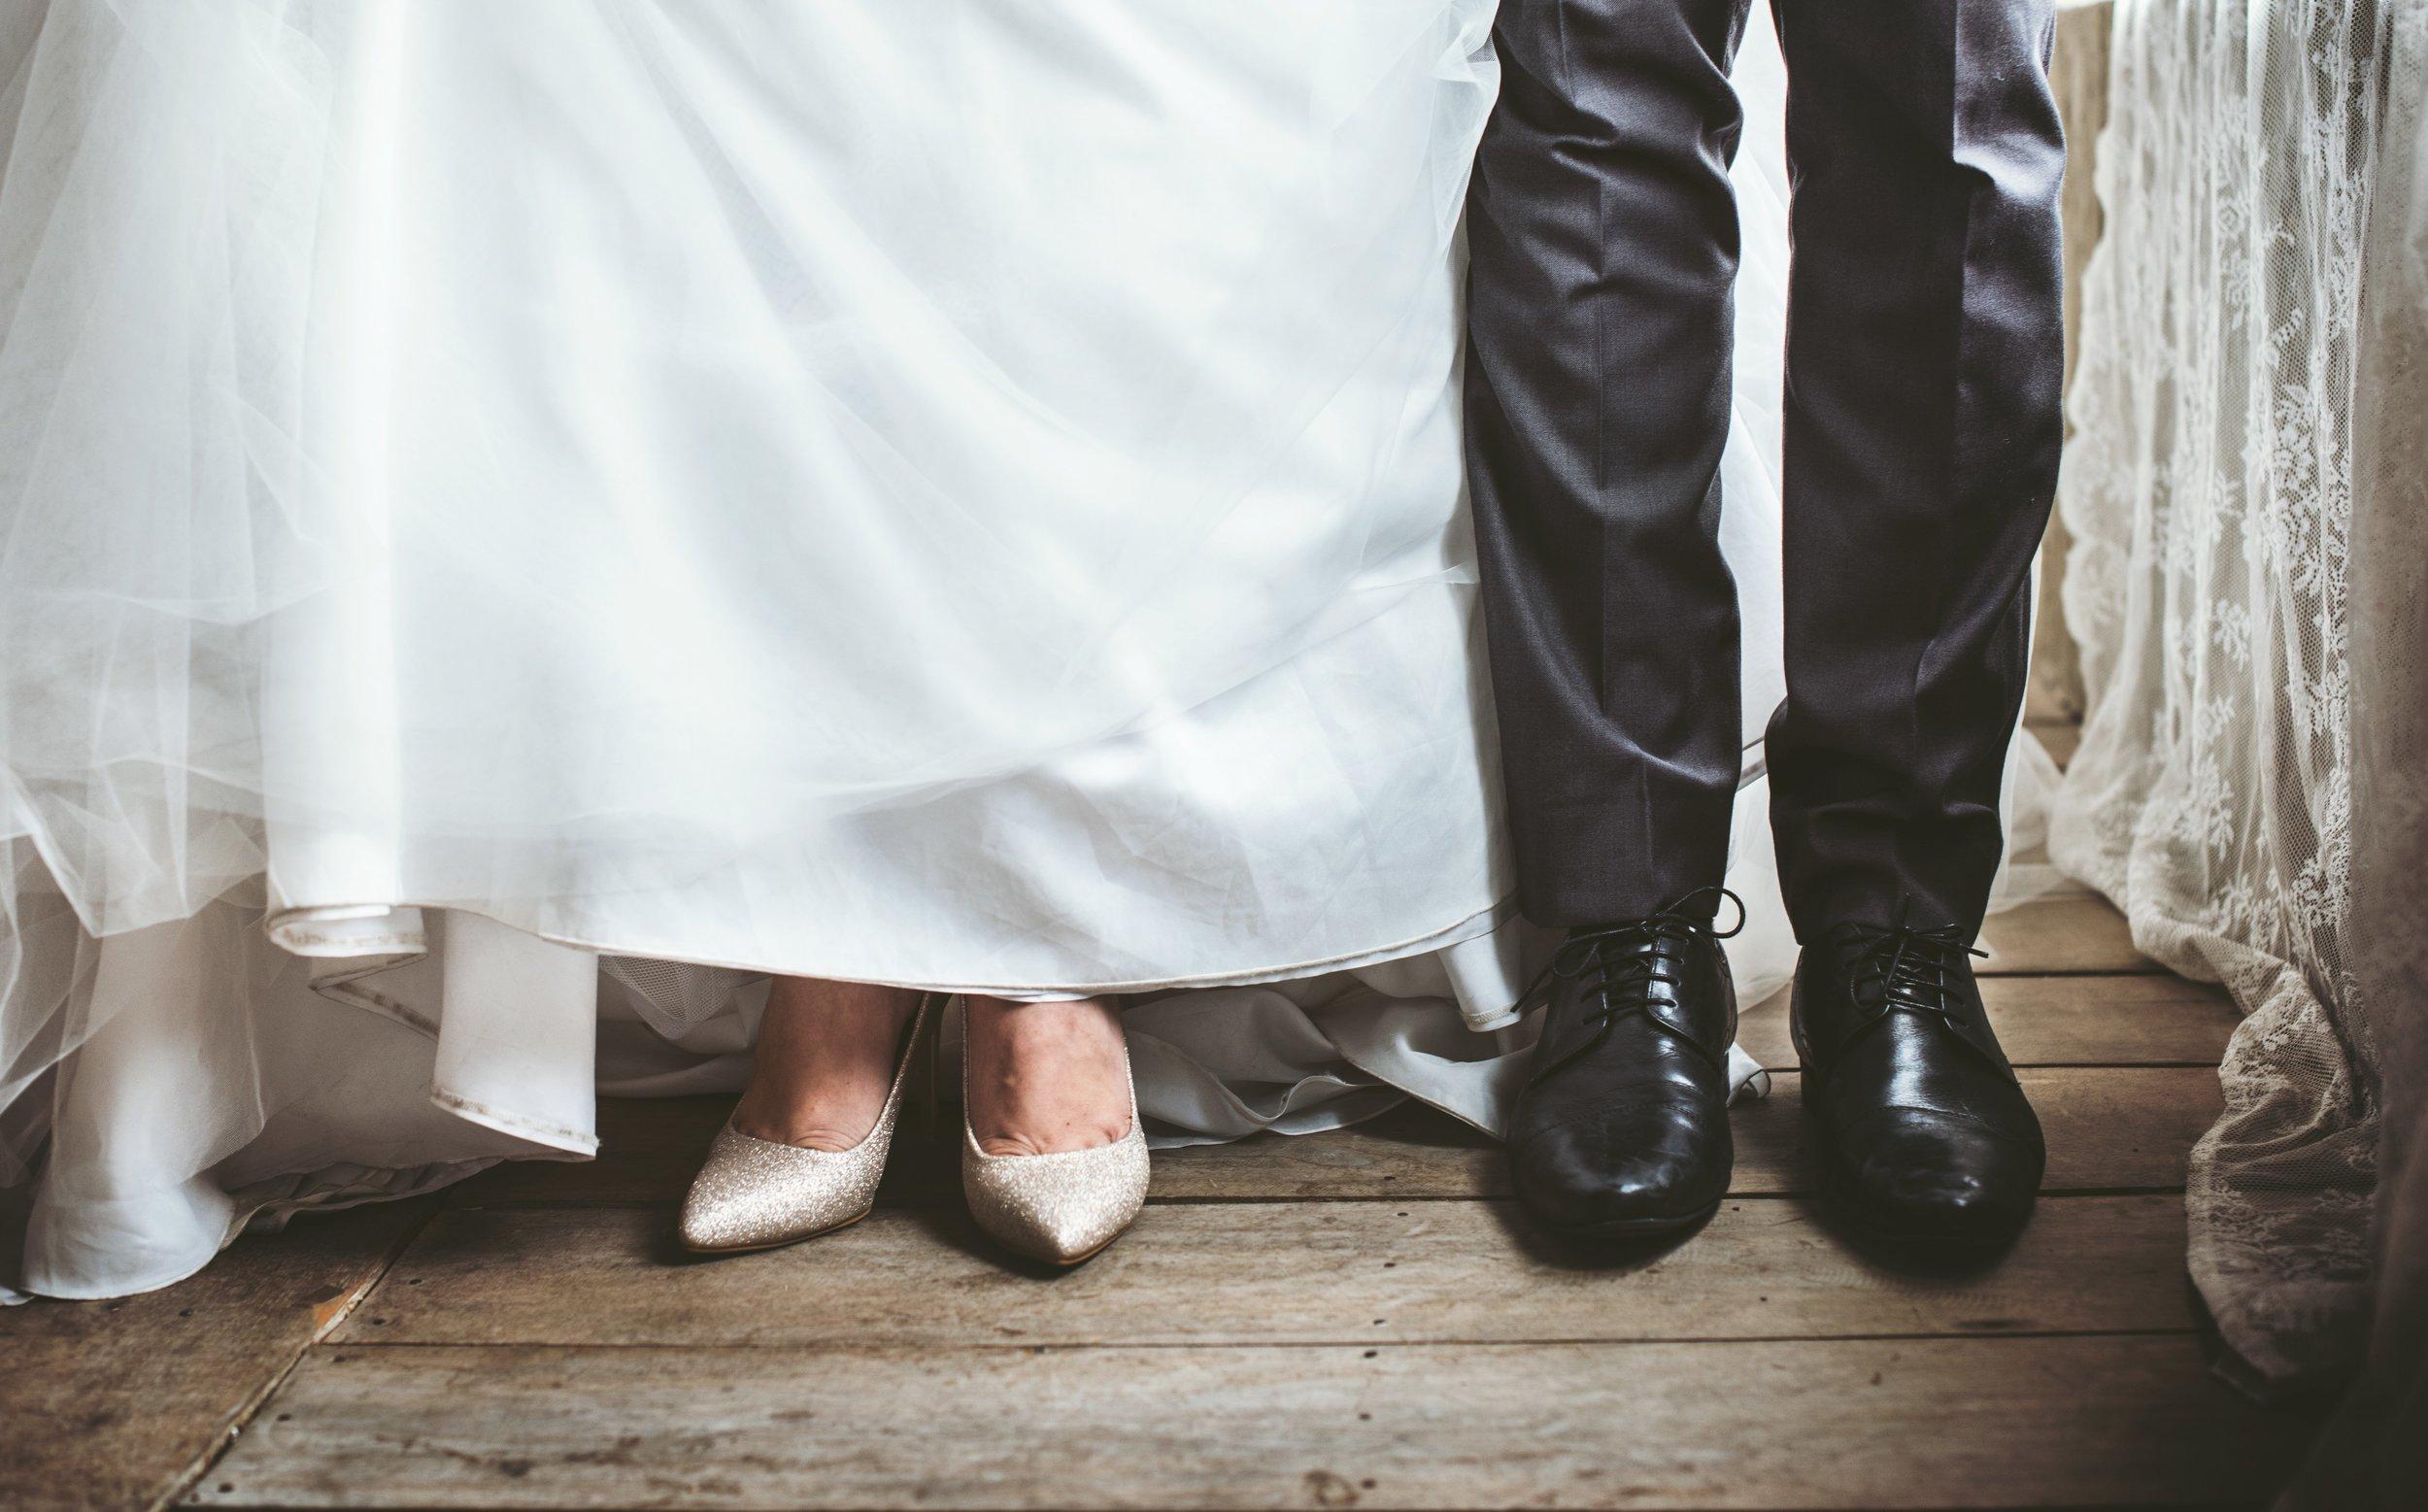 adults-bride-celebration-388238.jpg